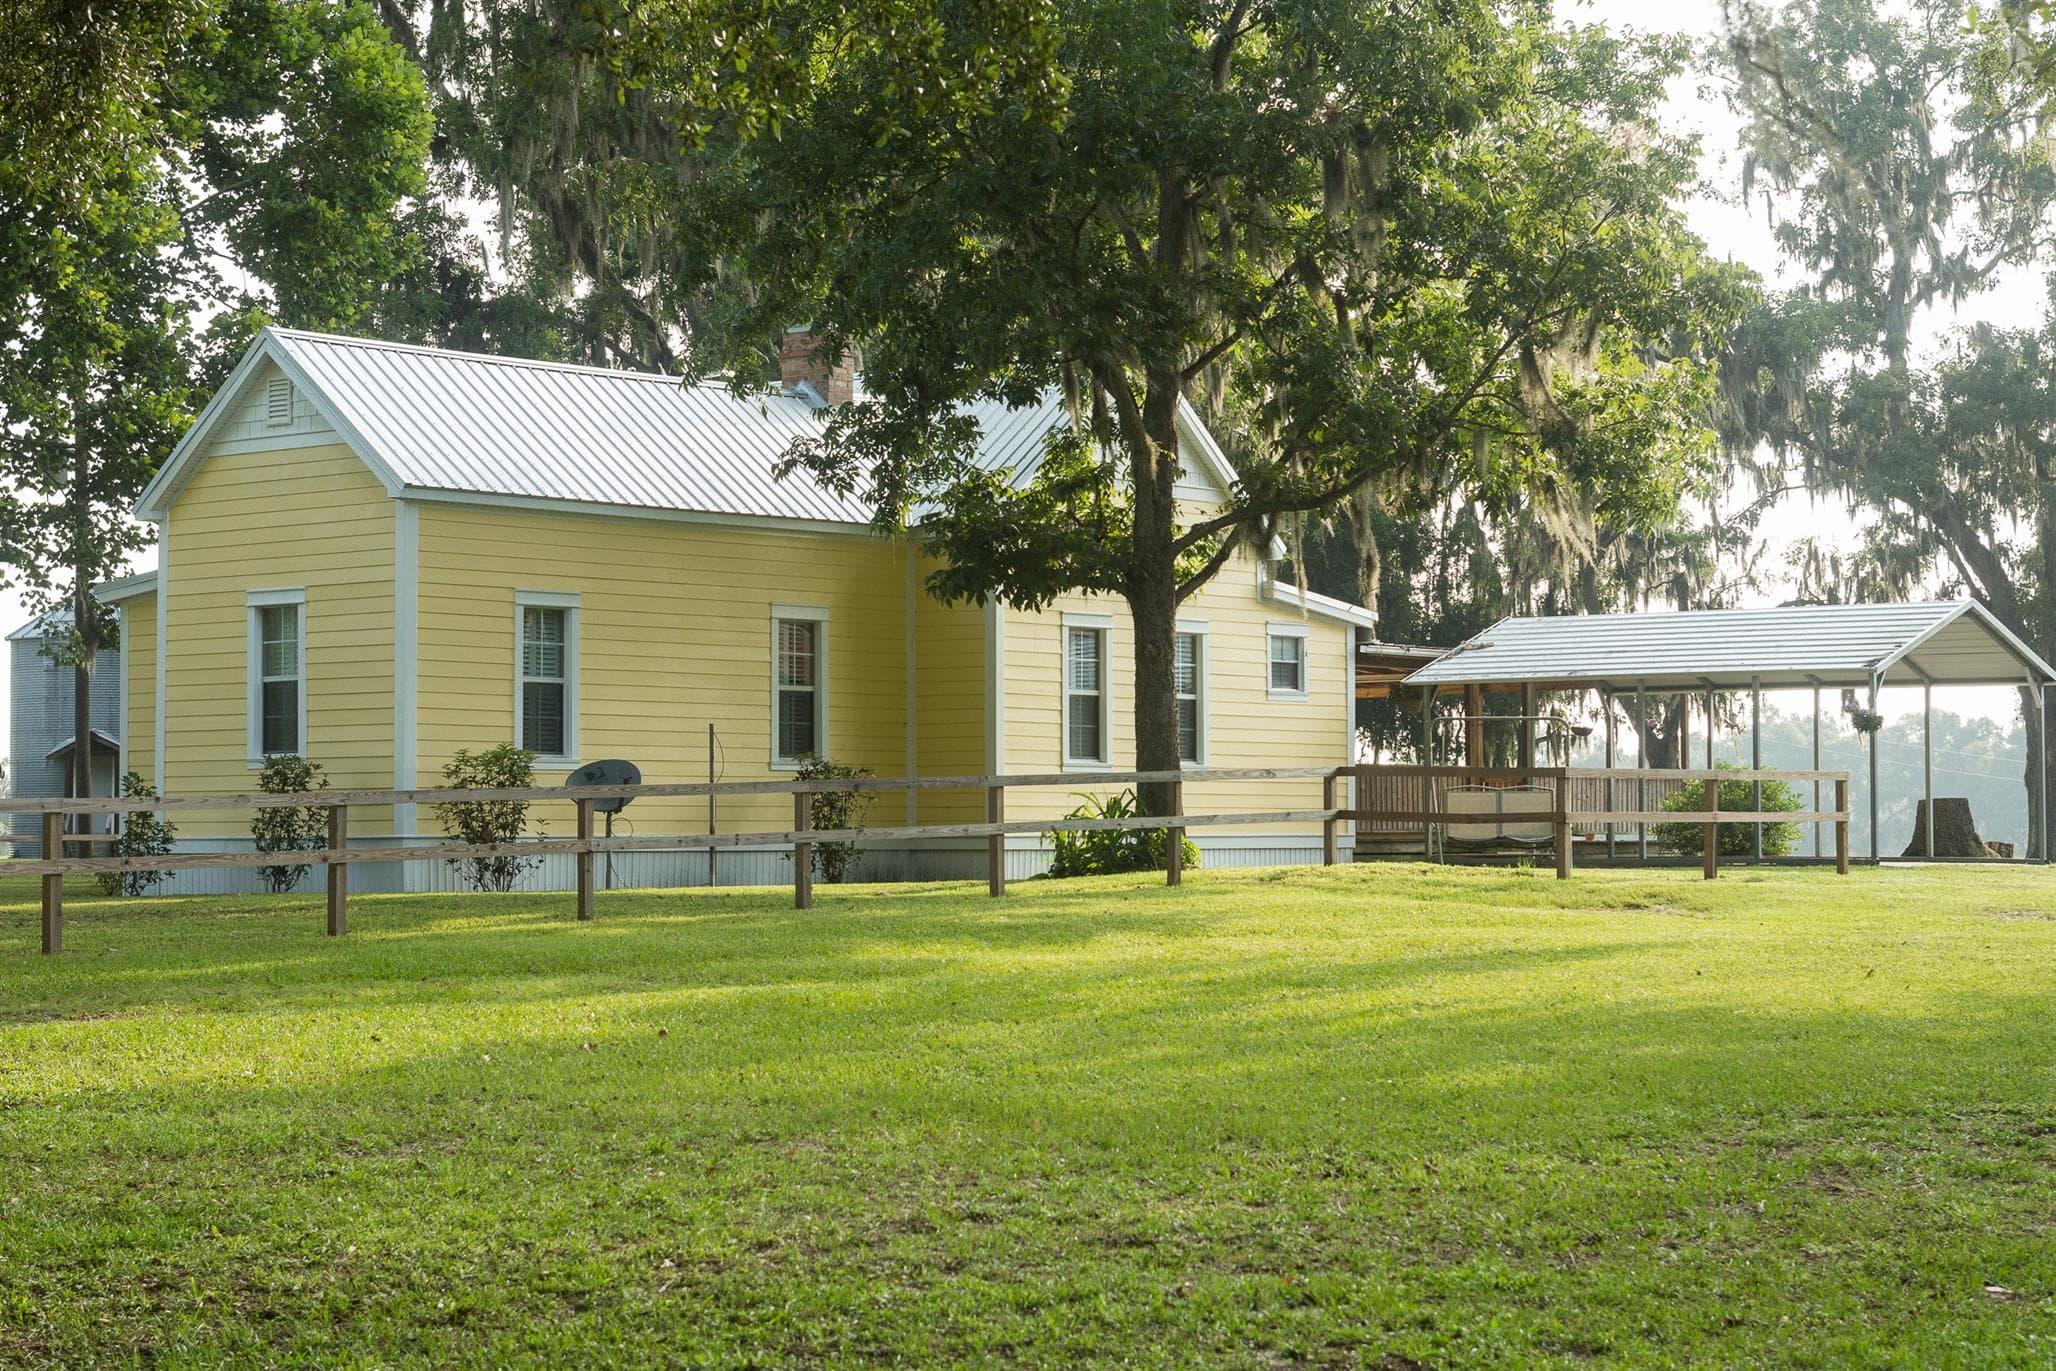 Wood frame home for sale in Live Oak FL